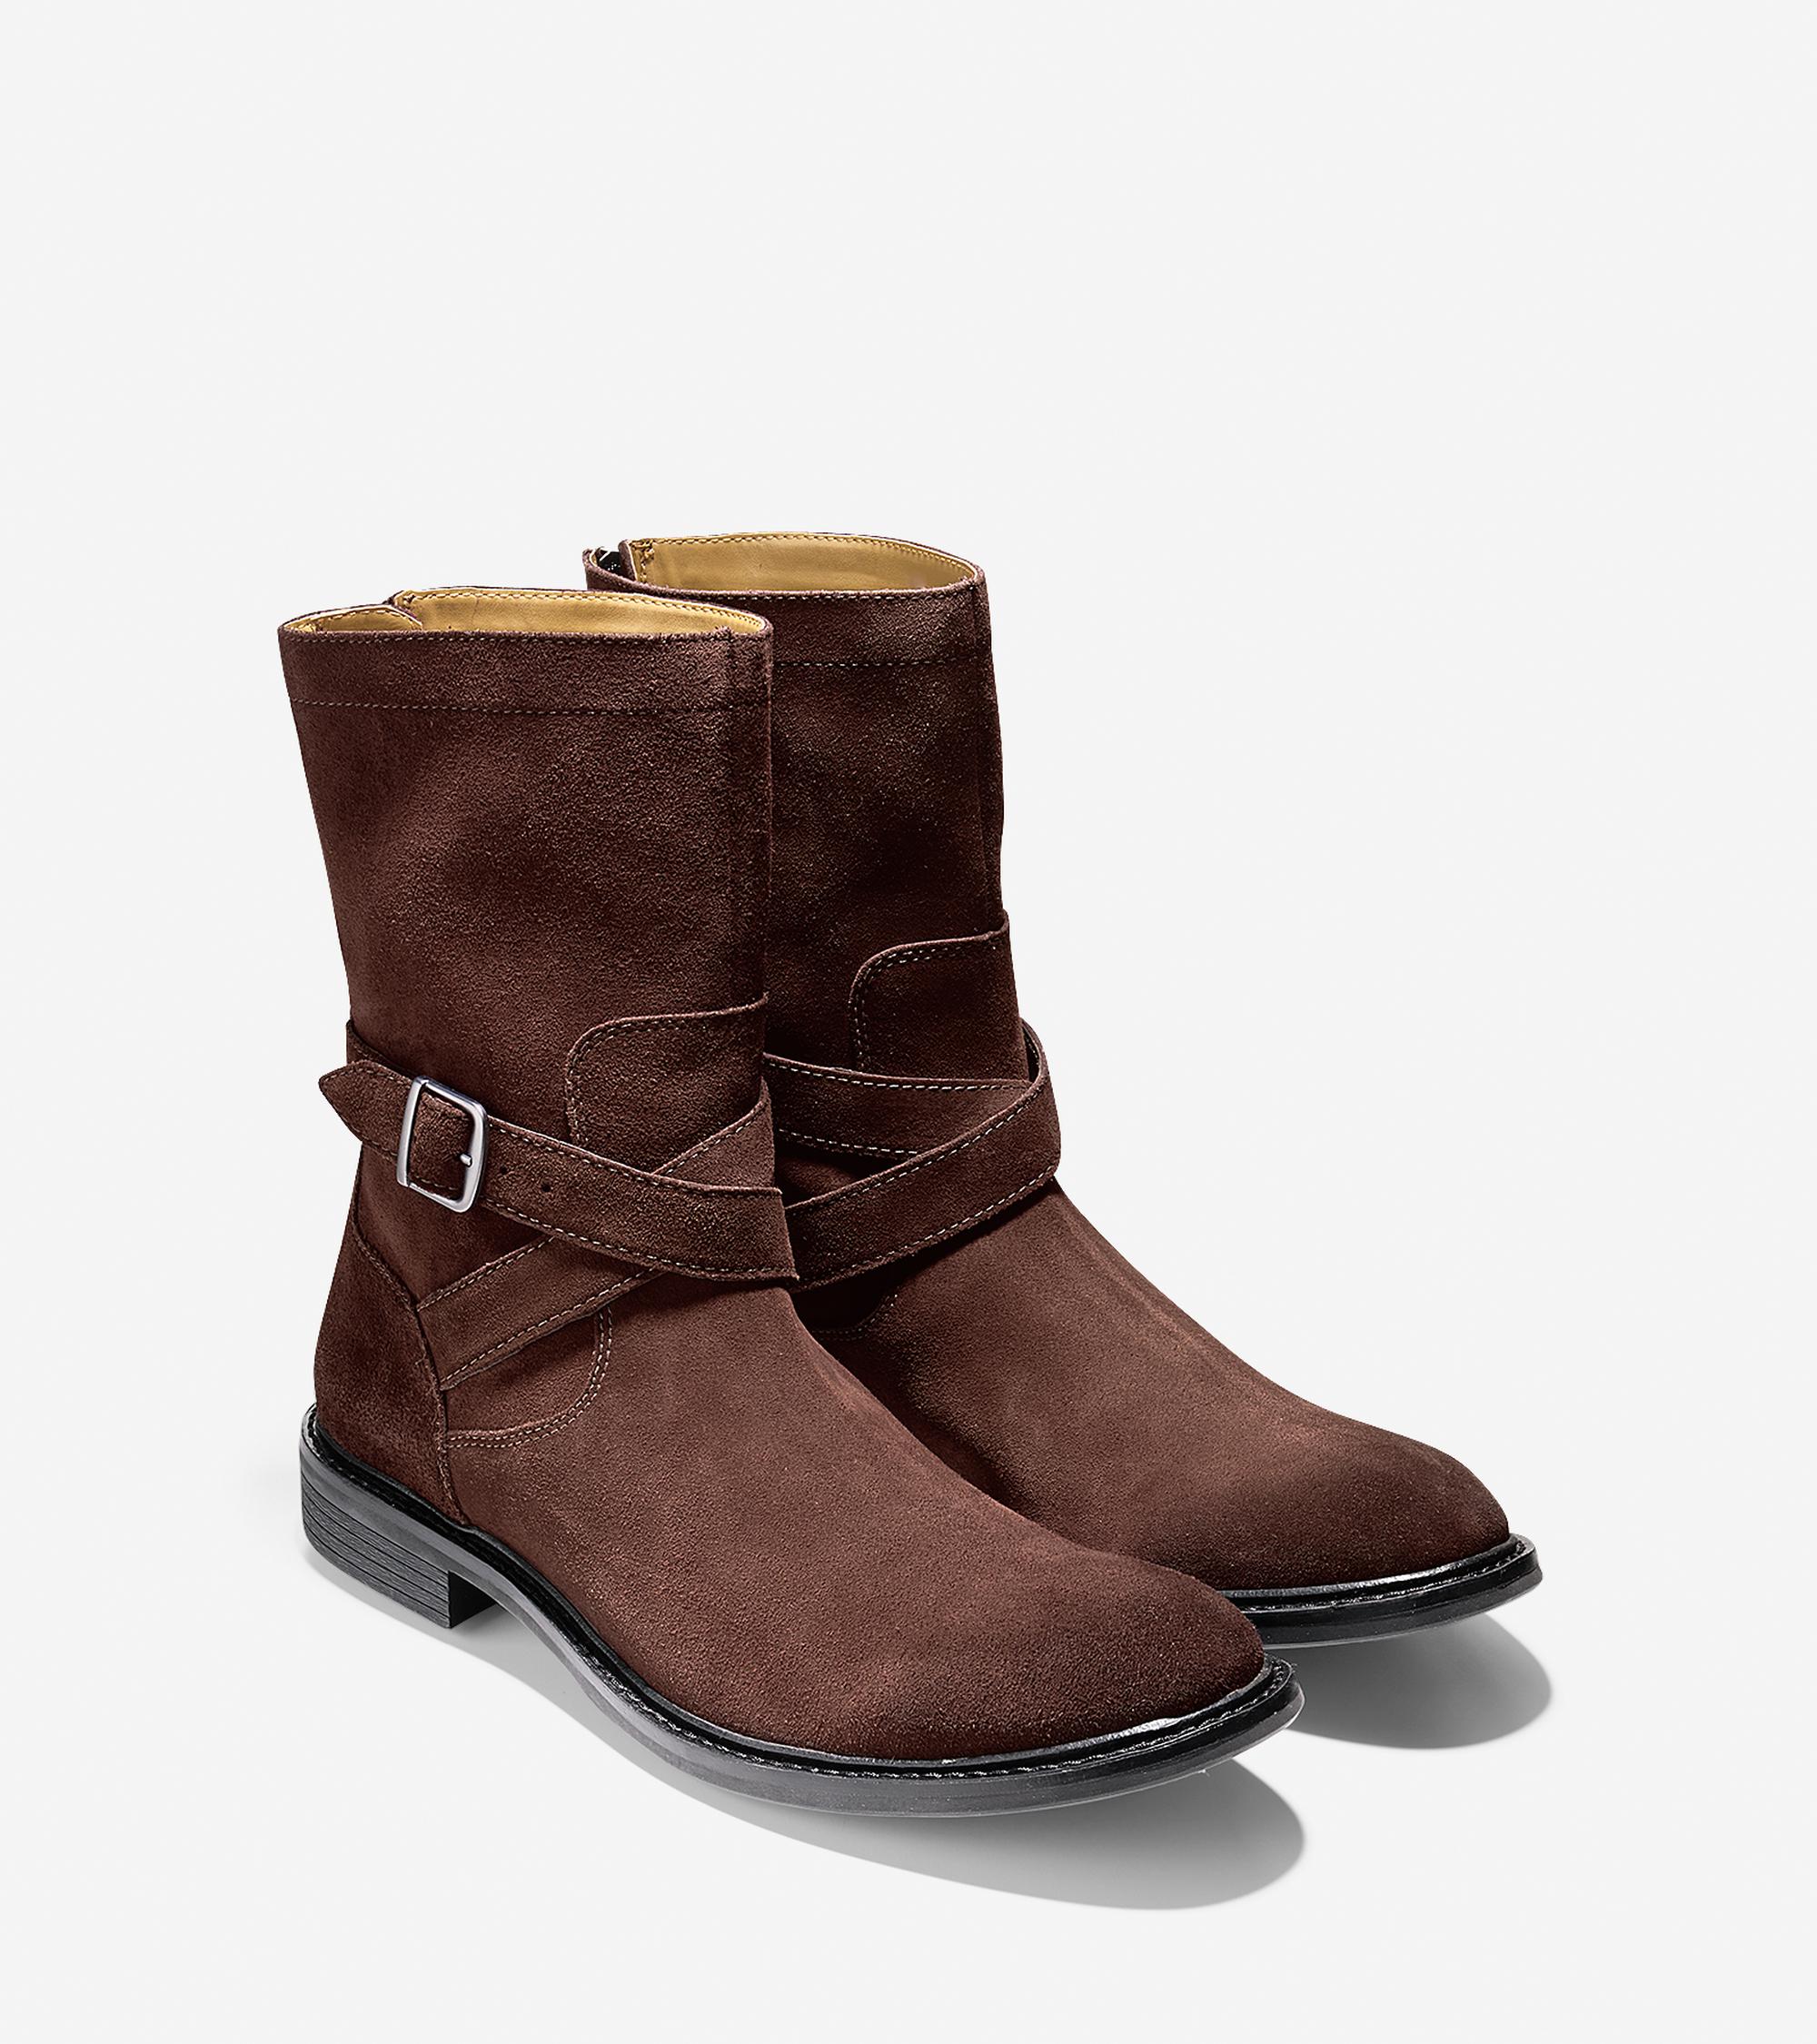 Cole Haan Brown Linen Shoes